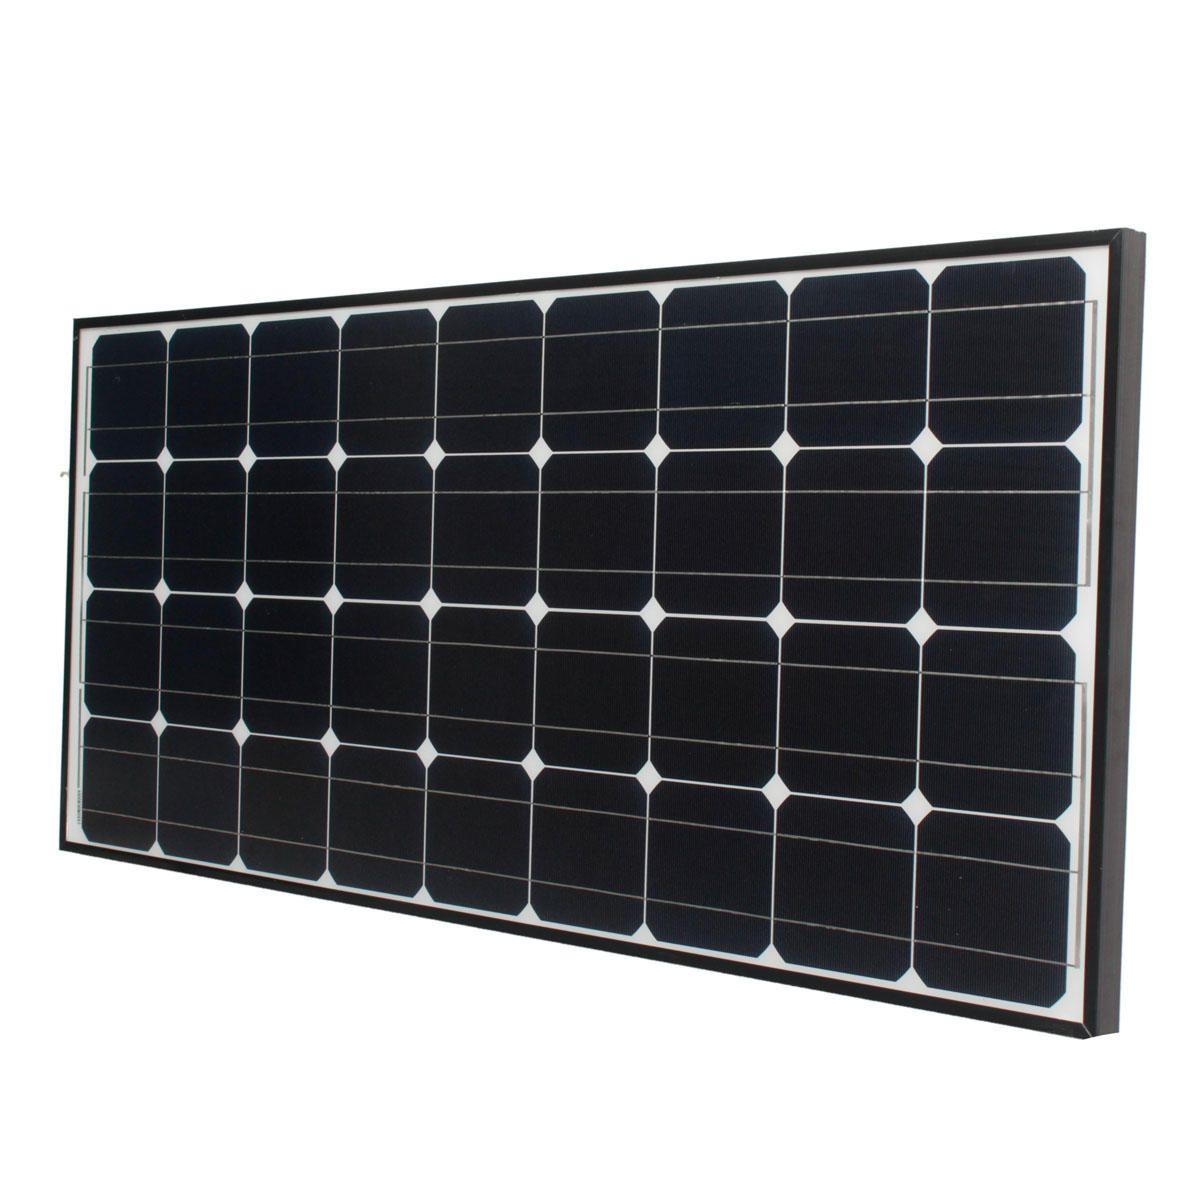 Elfeland M 150 150w 18v Monocrystalline Silicon Solar Panel Battery Charger Boat Caravan Motorhosaya Peralatan Pasokan Listrik From Alat Industri Ilmiah On